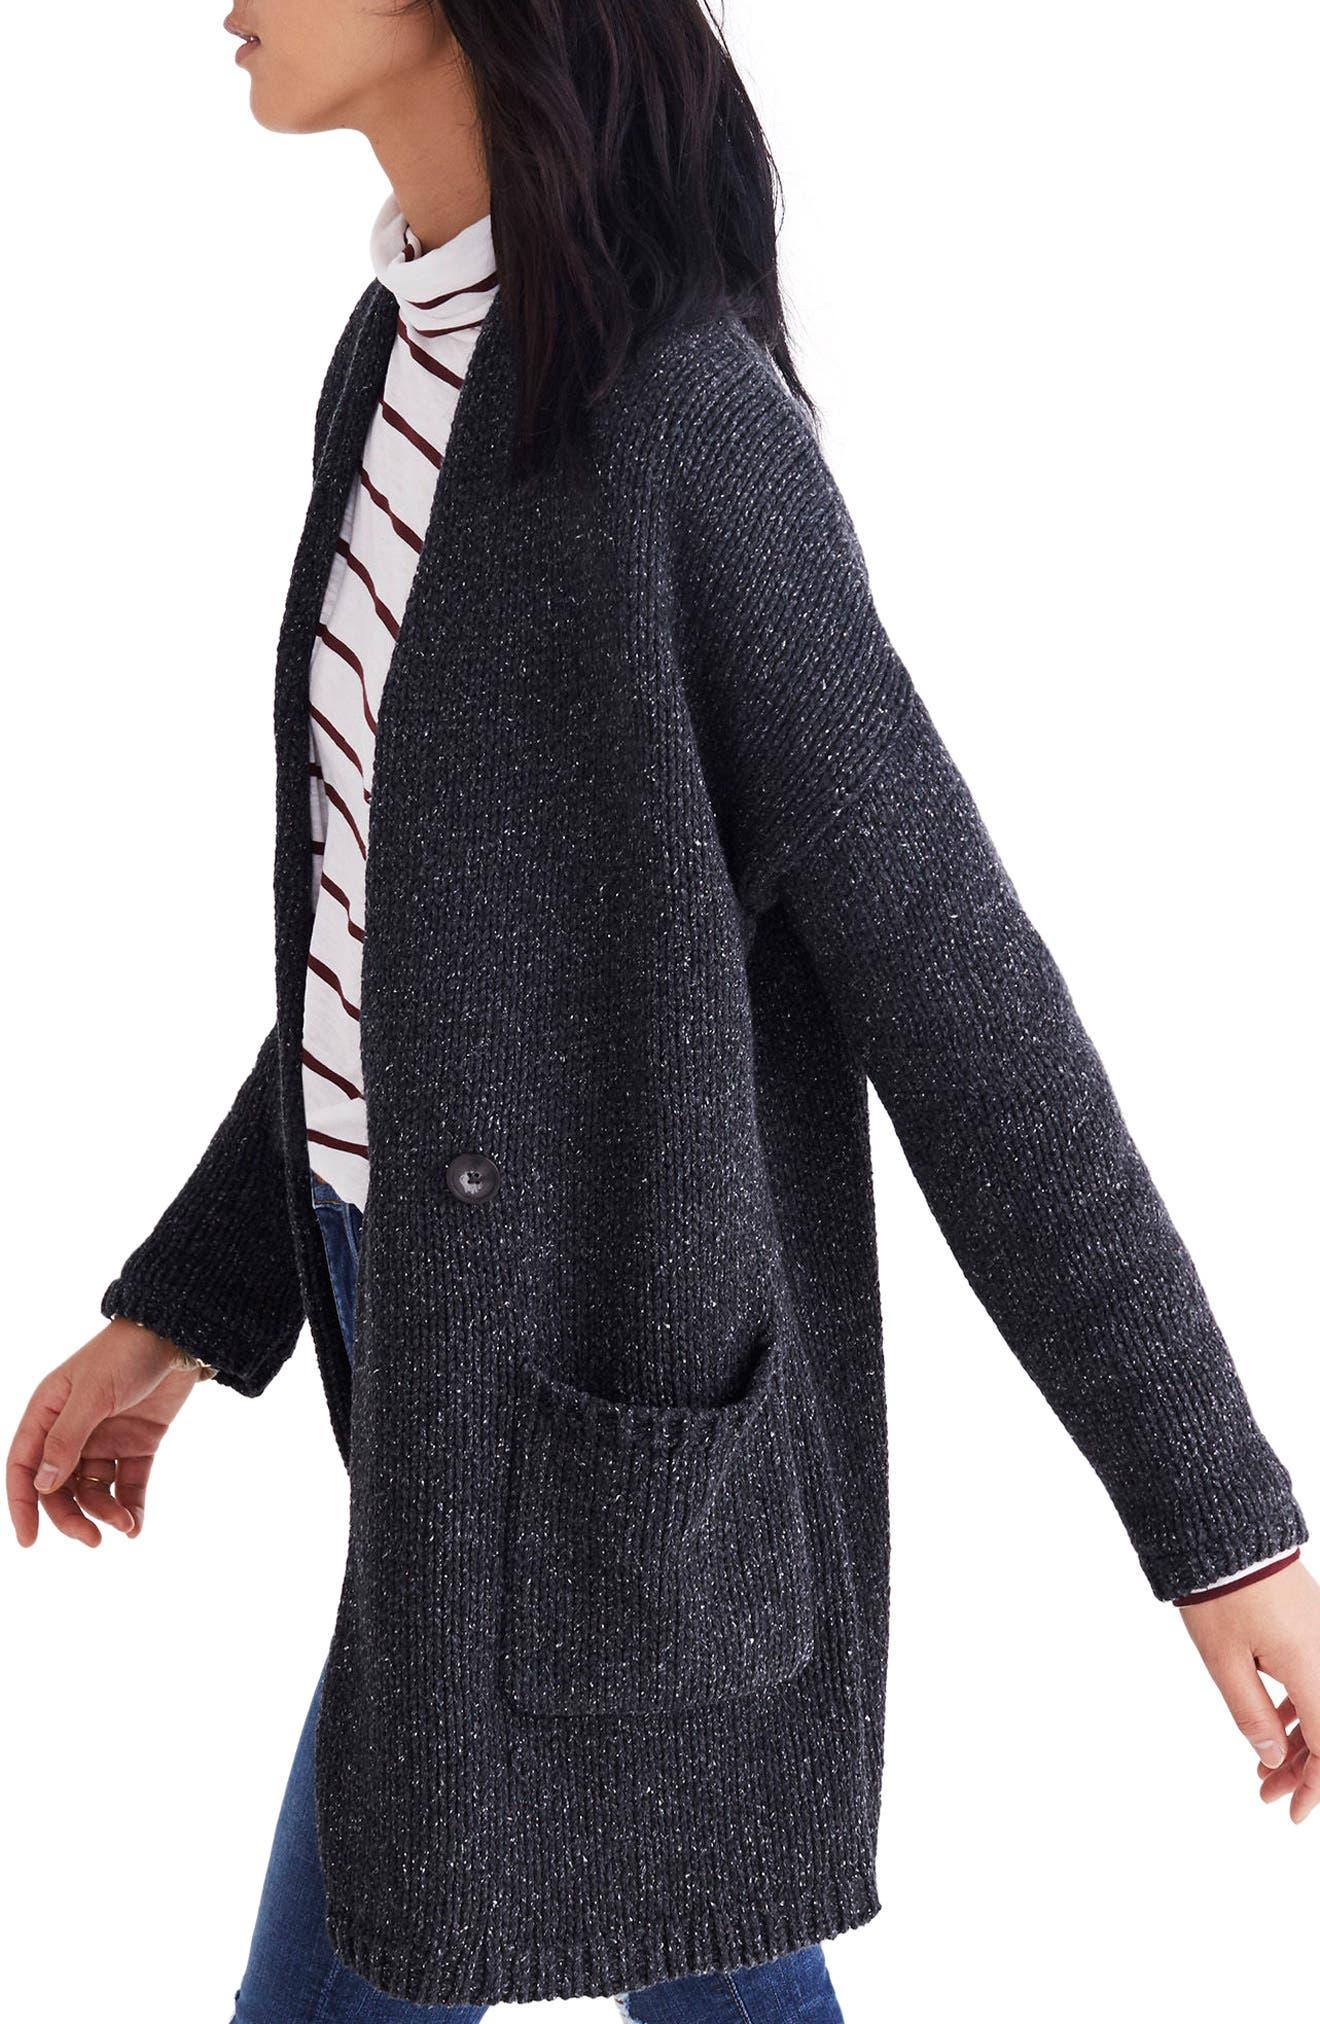 Glenhill Sweater Coat,                             Alternate thumbnail 3, color,                             Ashland Slate